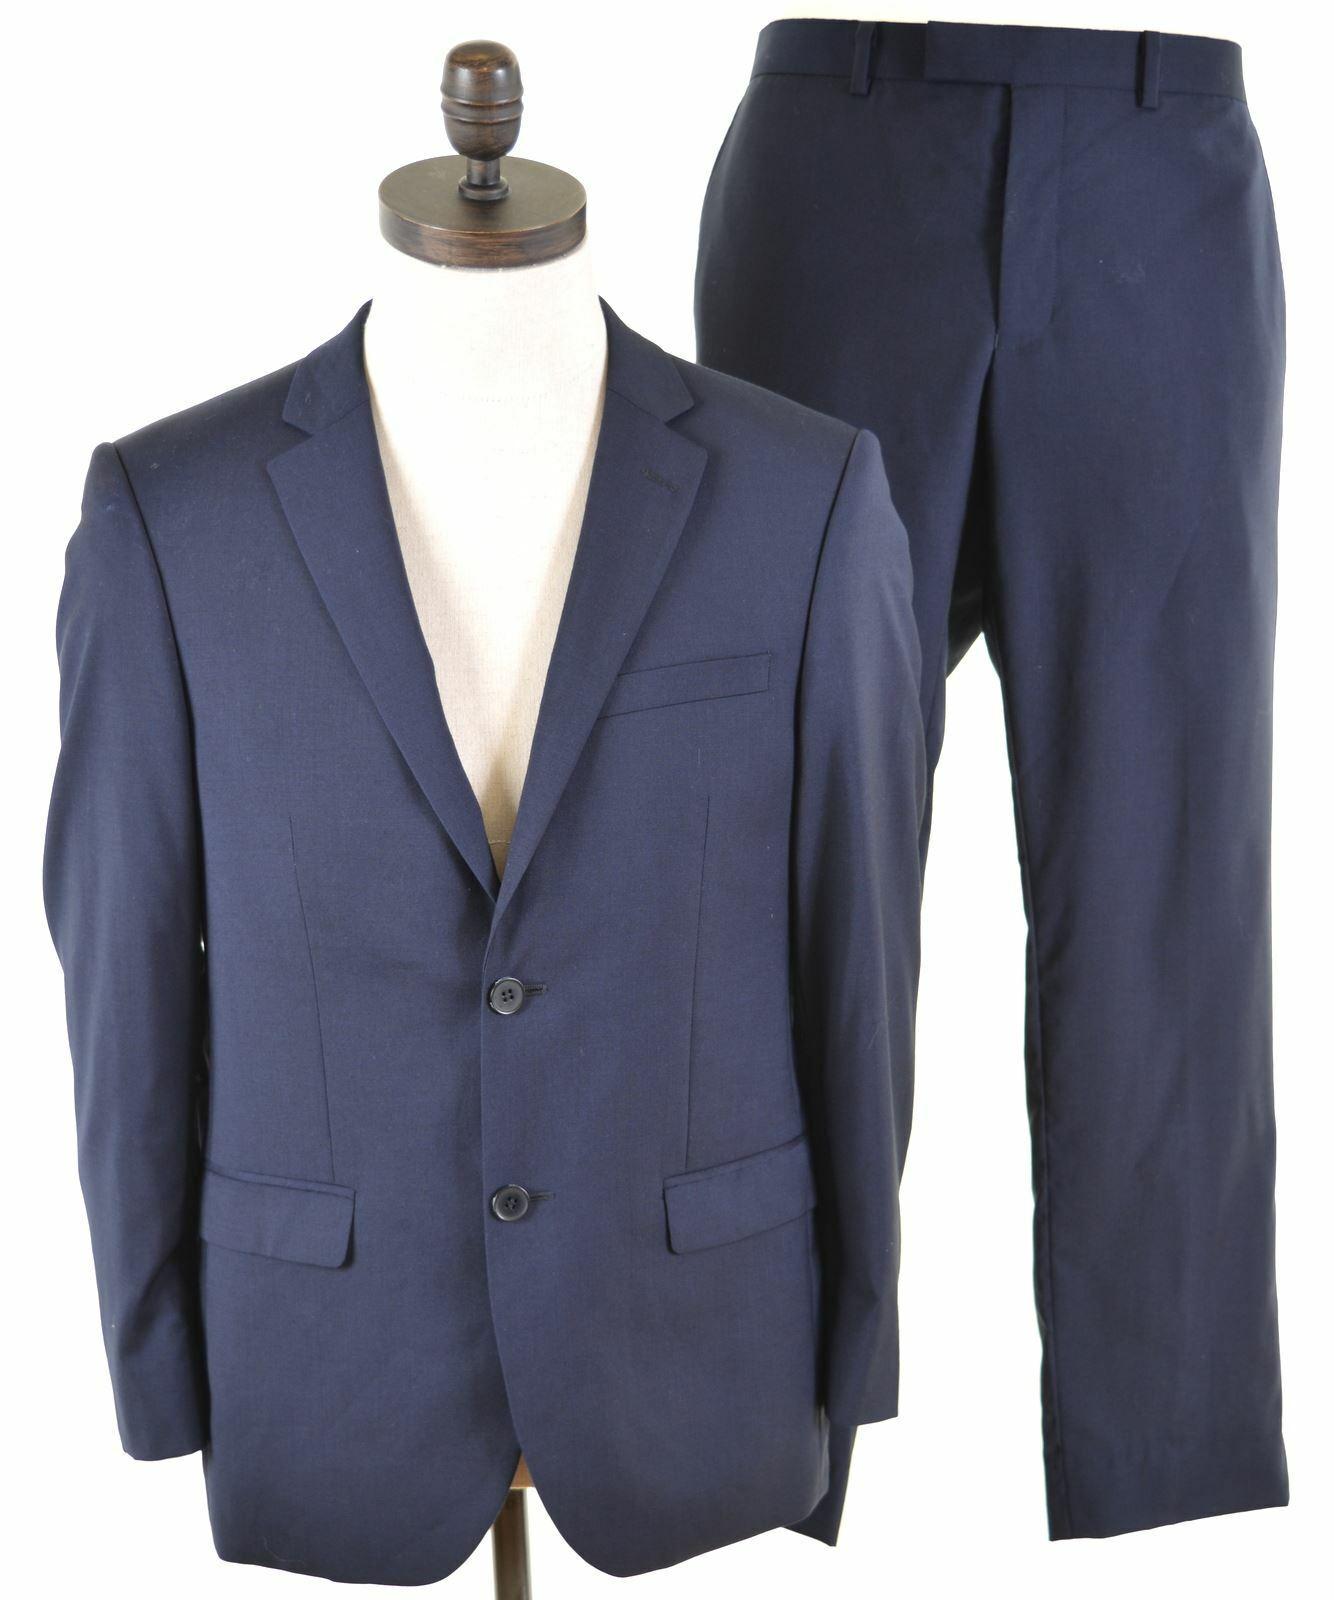 DKNY Mens 2 Piece Suit Größe 38 Medium W34 L28 Navy Blau Wool Slim Fit  IX26